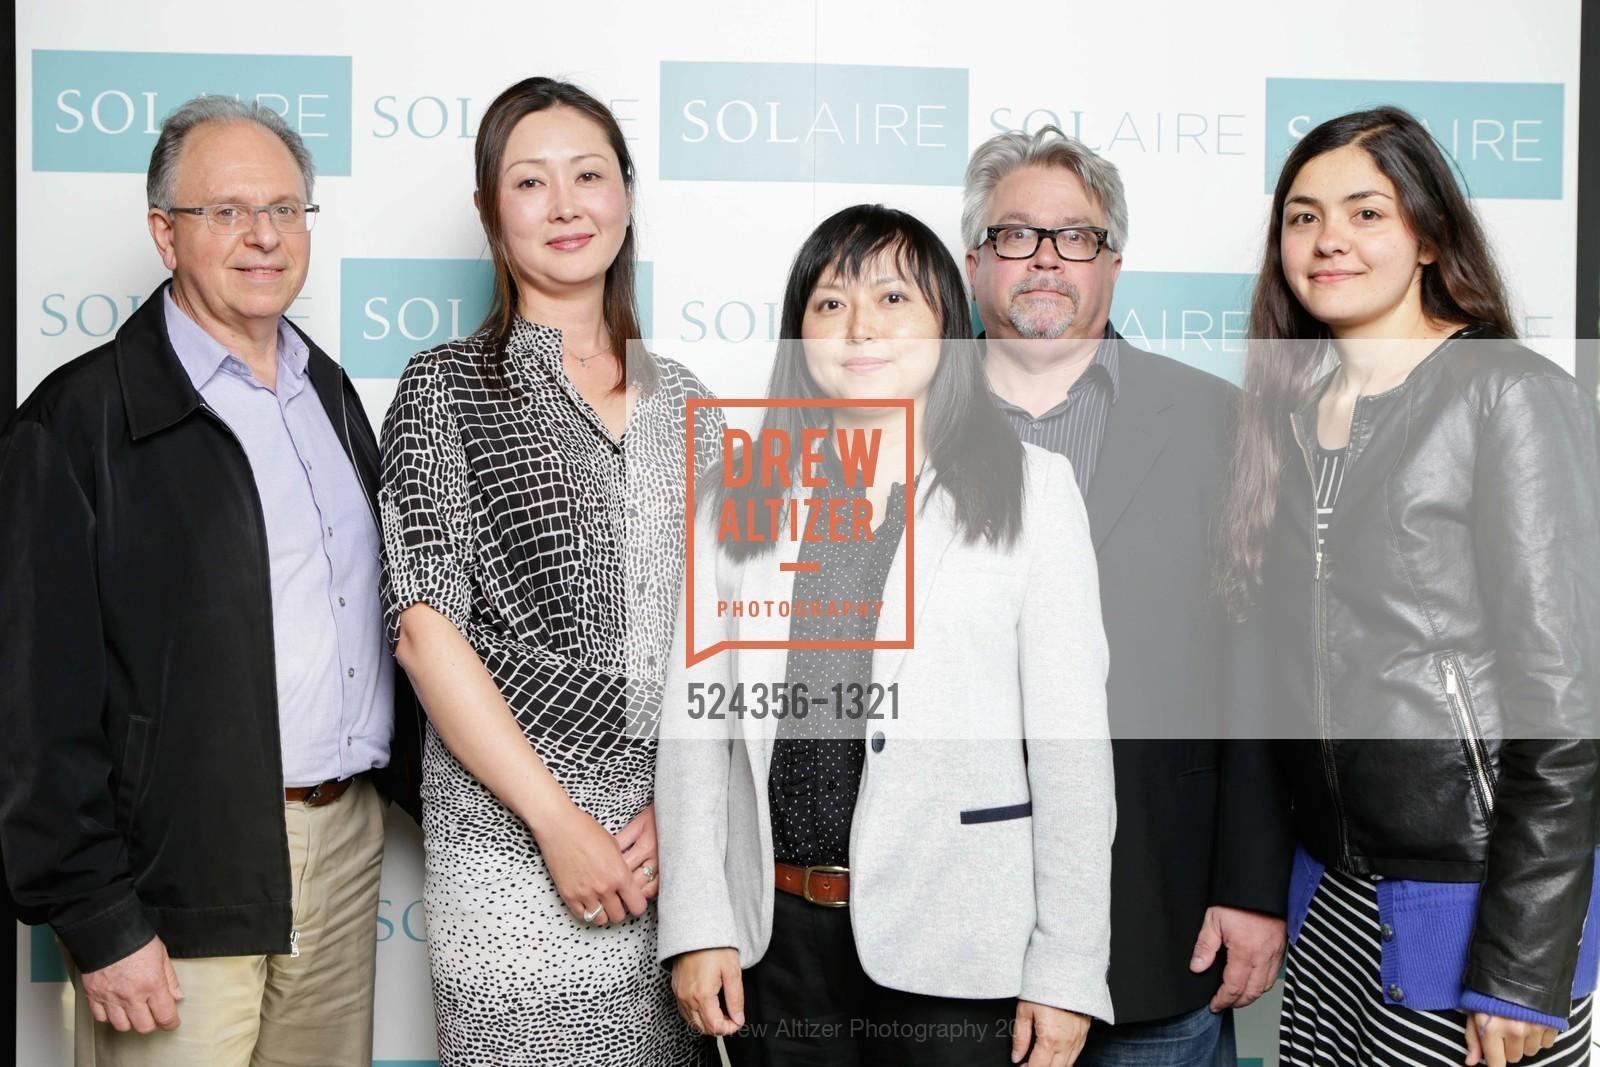 Robert Colyer, Naomi Motomura, Dawn Yim, Vern Lohman, Laudan Siahpolo, Photo #524356-1321